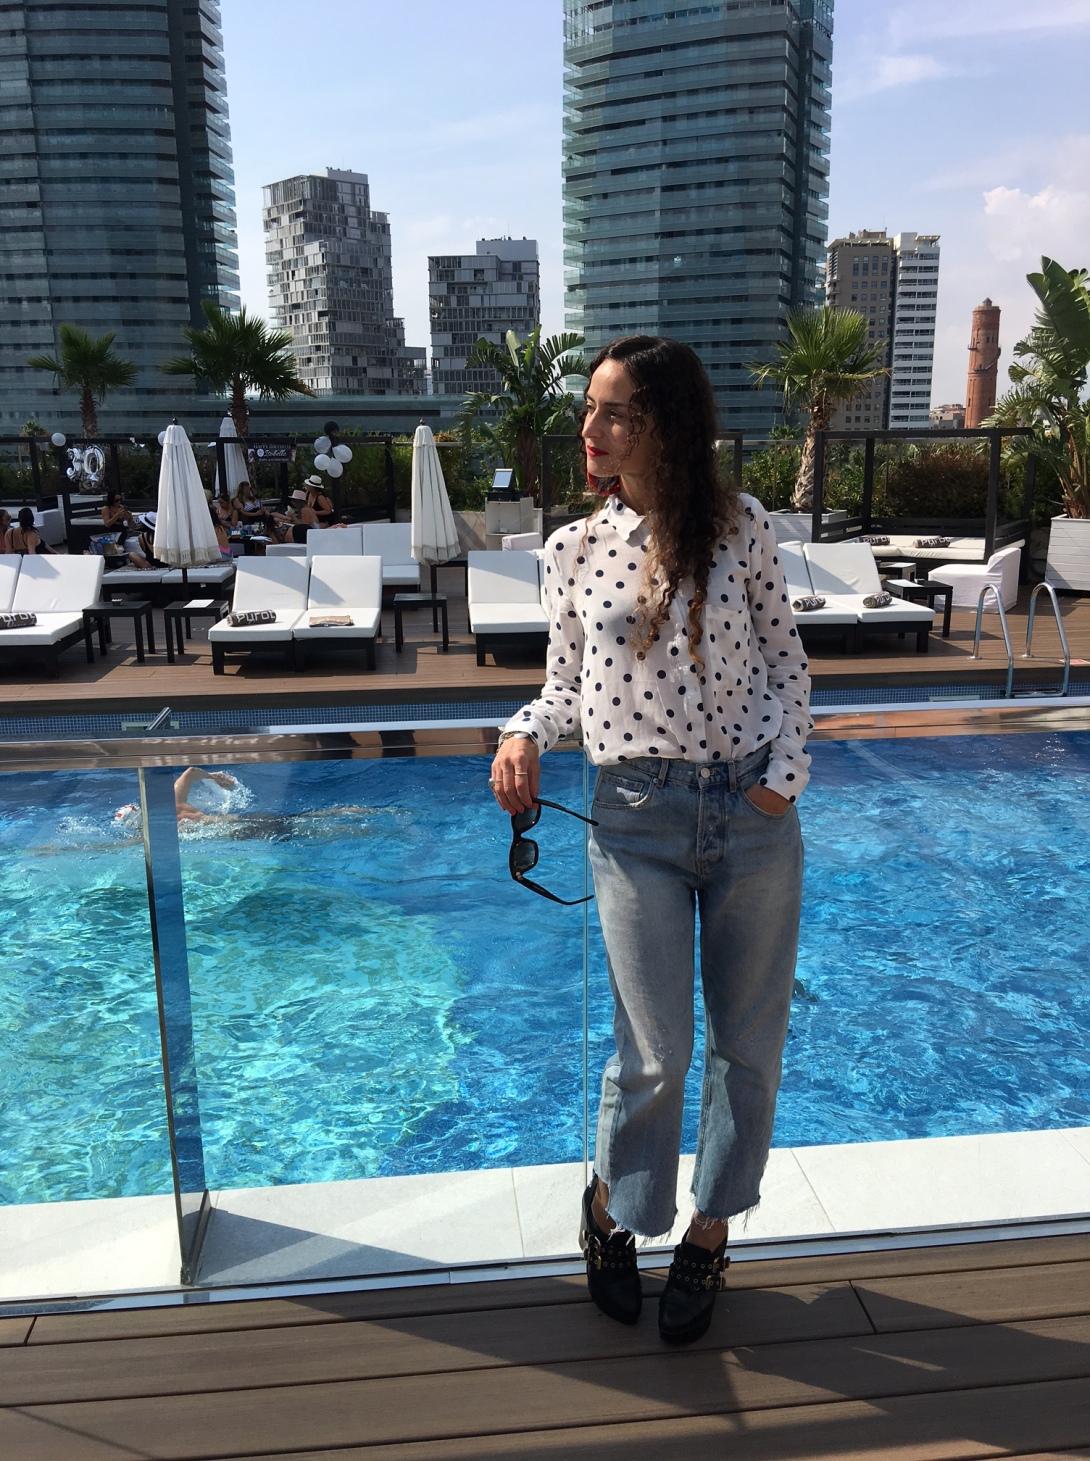 Brunch_Hotel Hilton Diagonal Mar_Barcelona_Clara De Nadal Trias_coolhunter and journalist_9